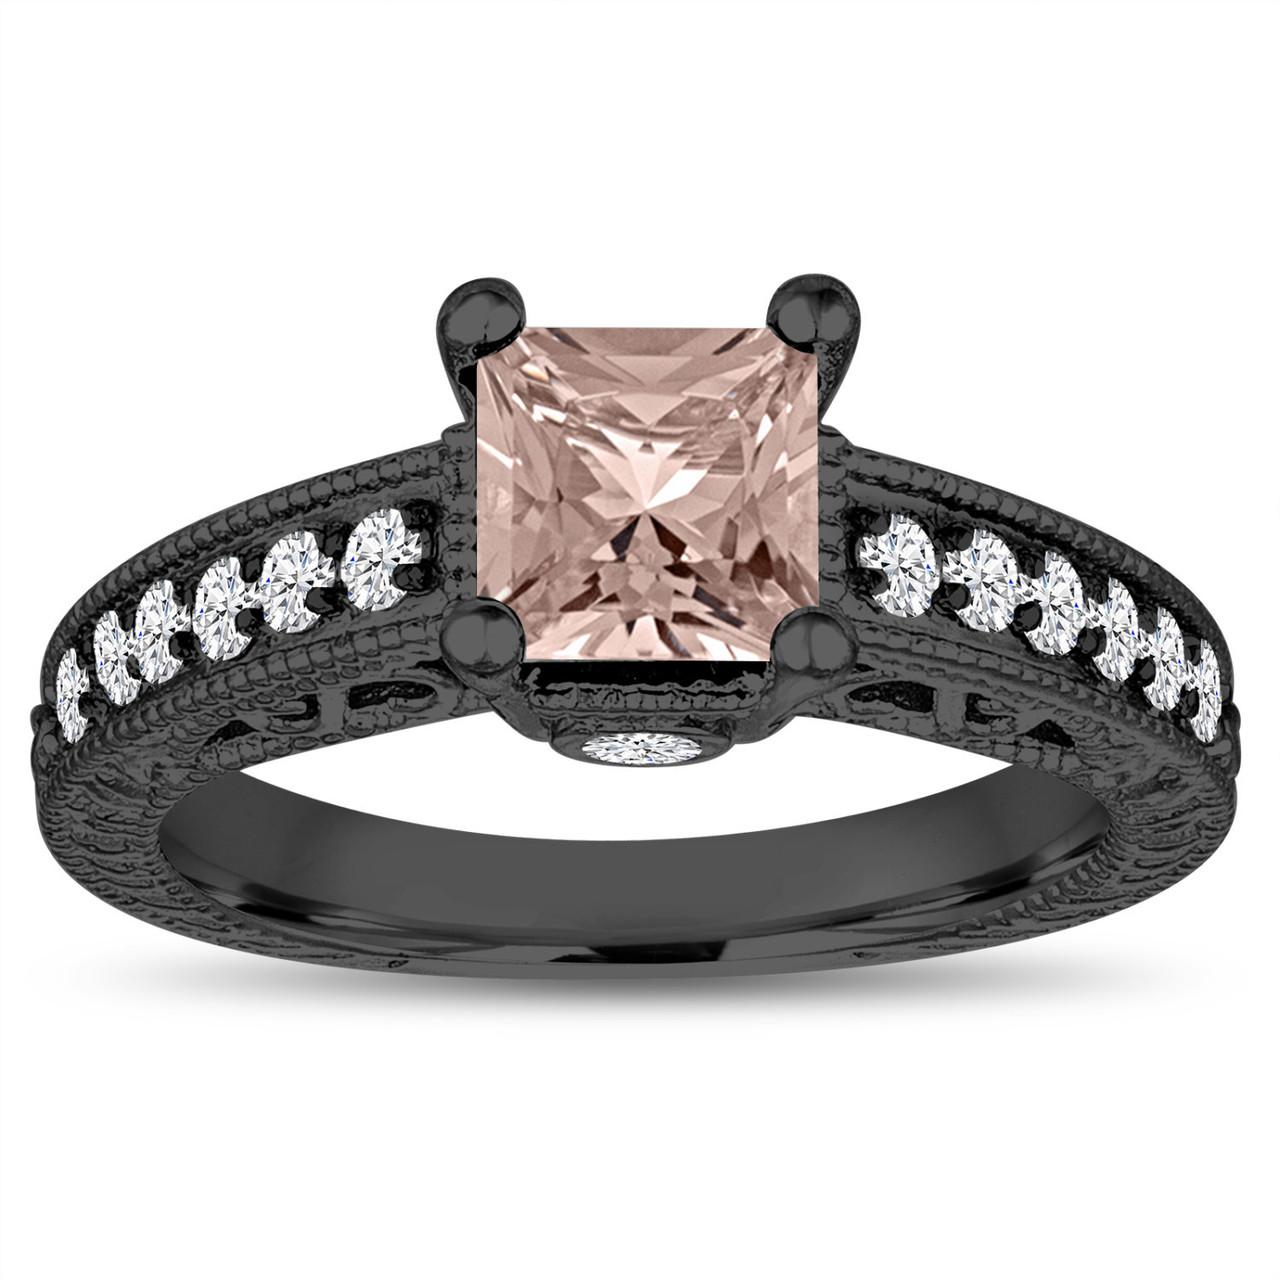 8f62325ce2e2c Vintage Morganite Engagement Ring, Princess Cut Wedding Ring, 1.32 Carat  14k Black Gold Unique Vintage Antique Style Handmade